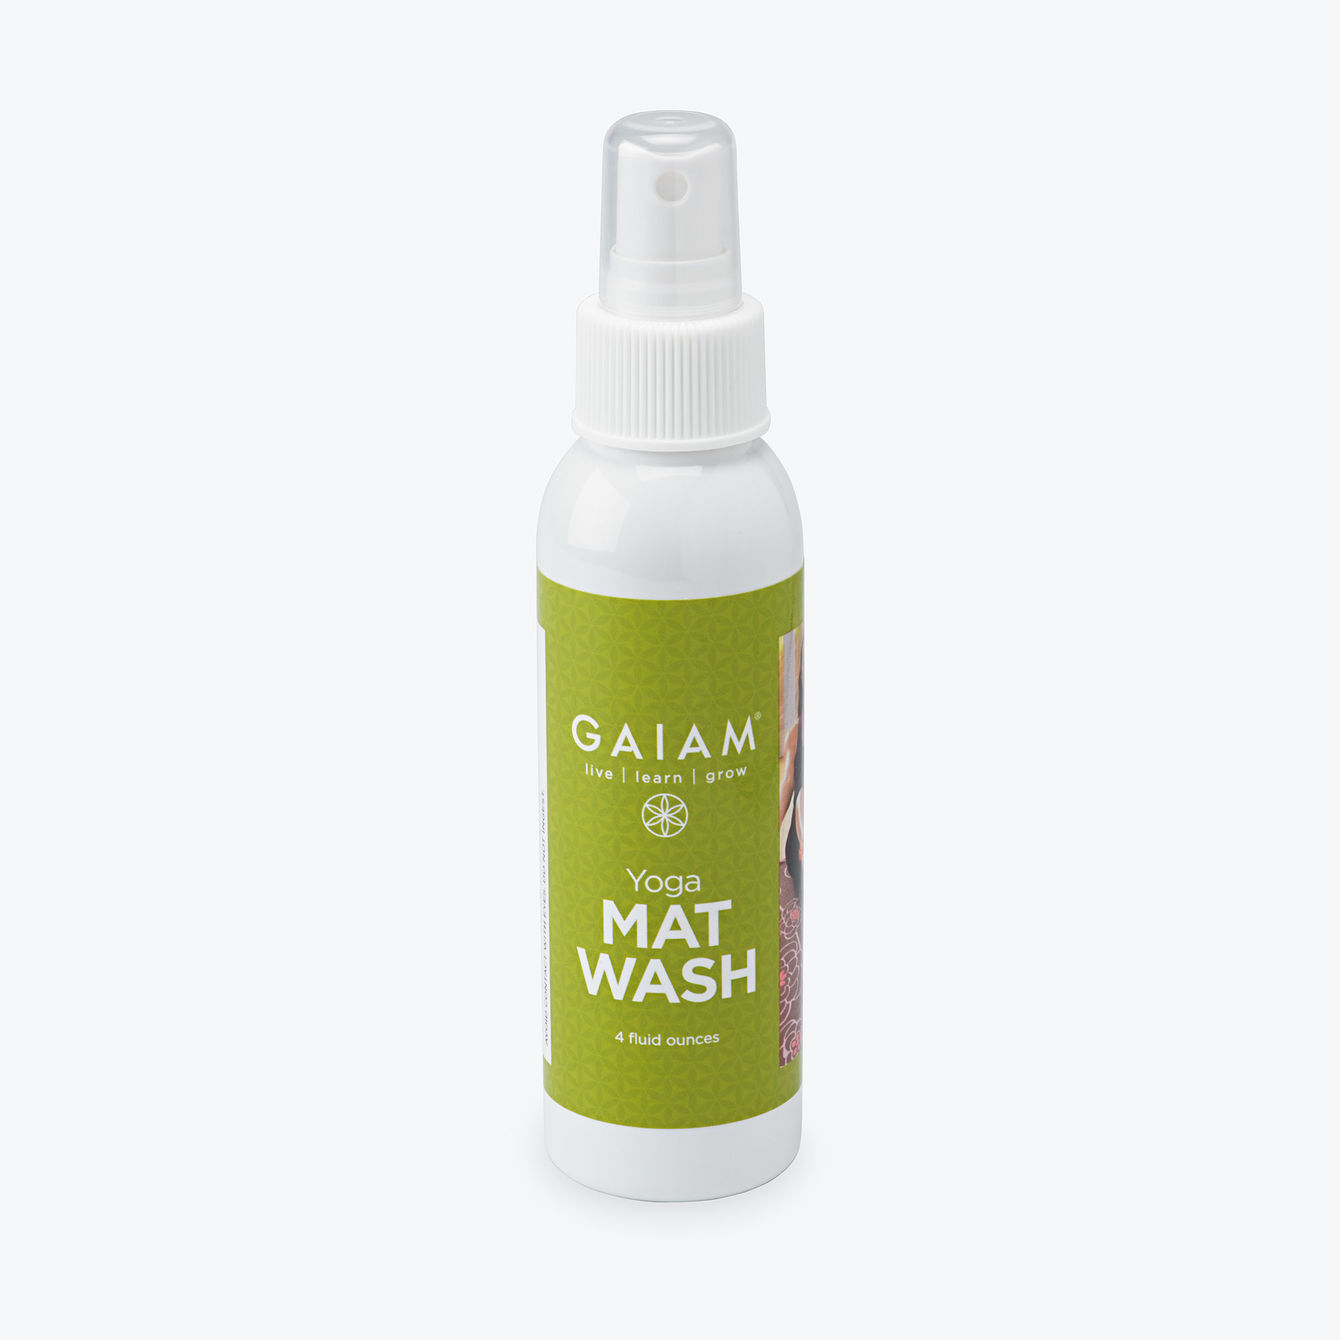 Gaiam Super Yoga Mat Wash